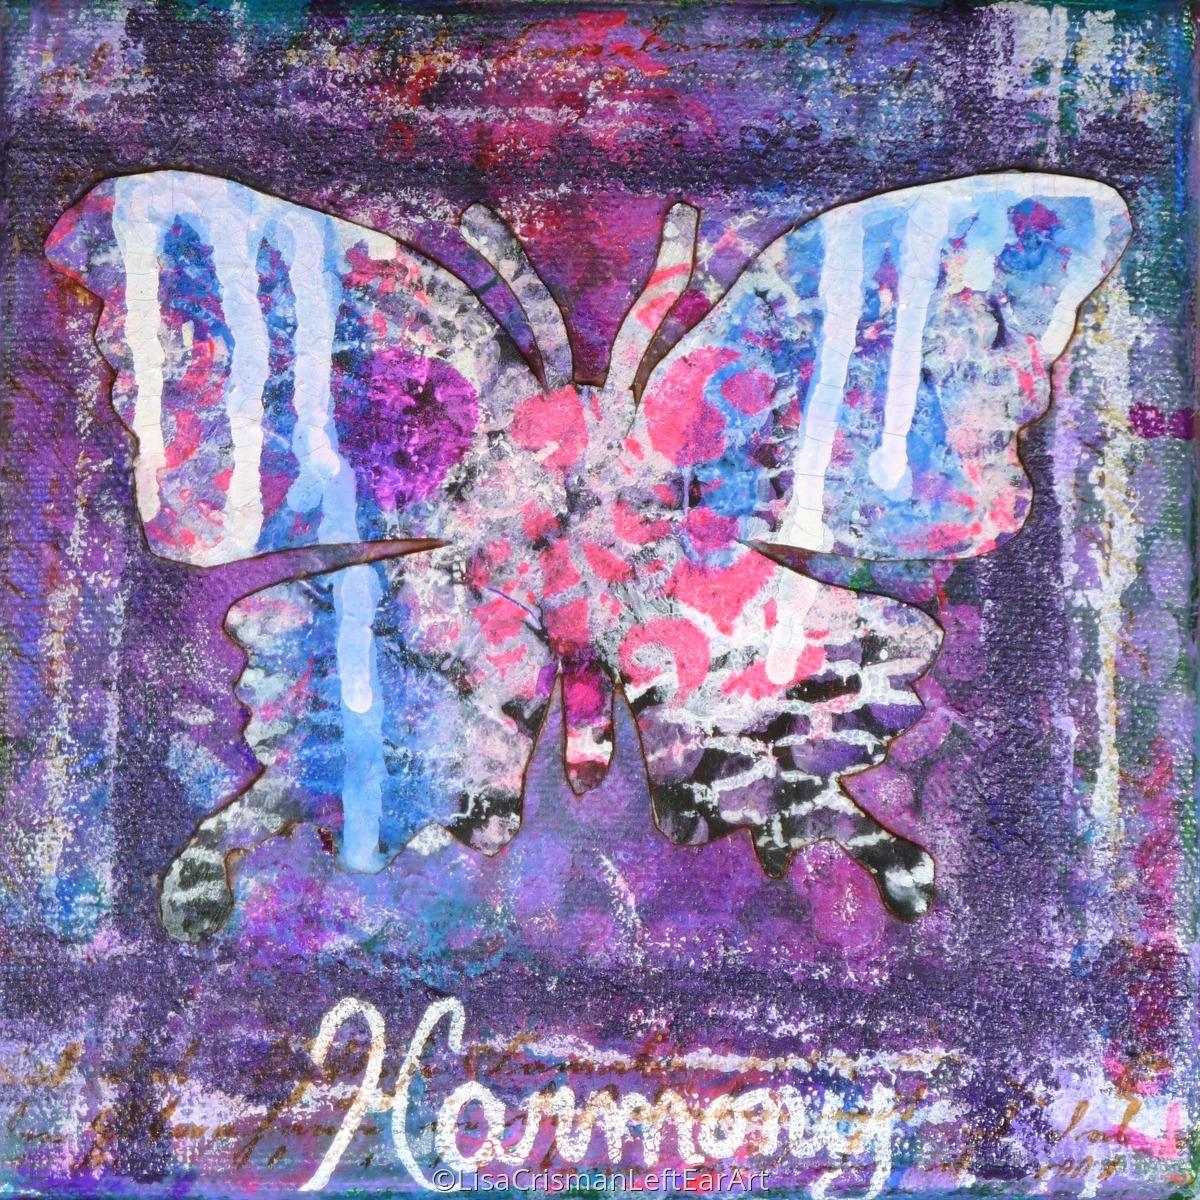 Harmony (large view)